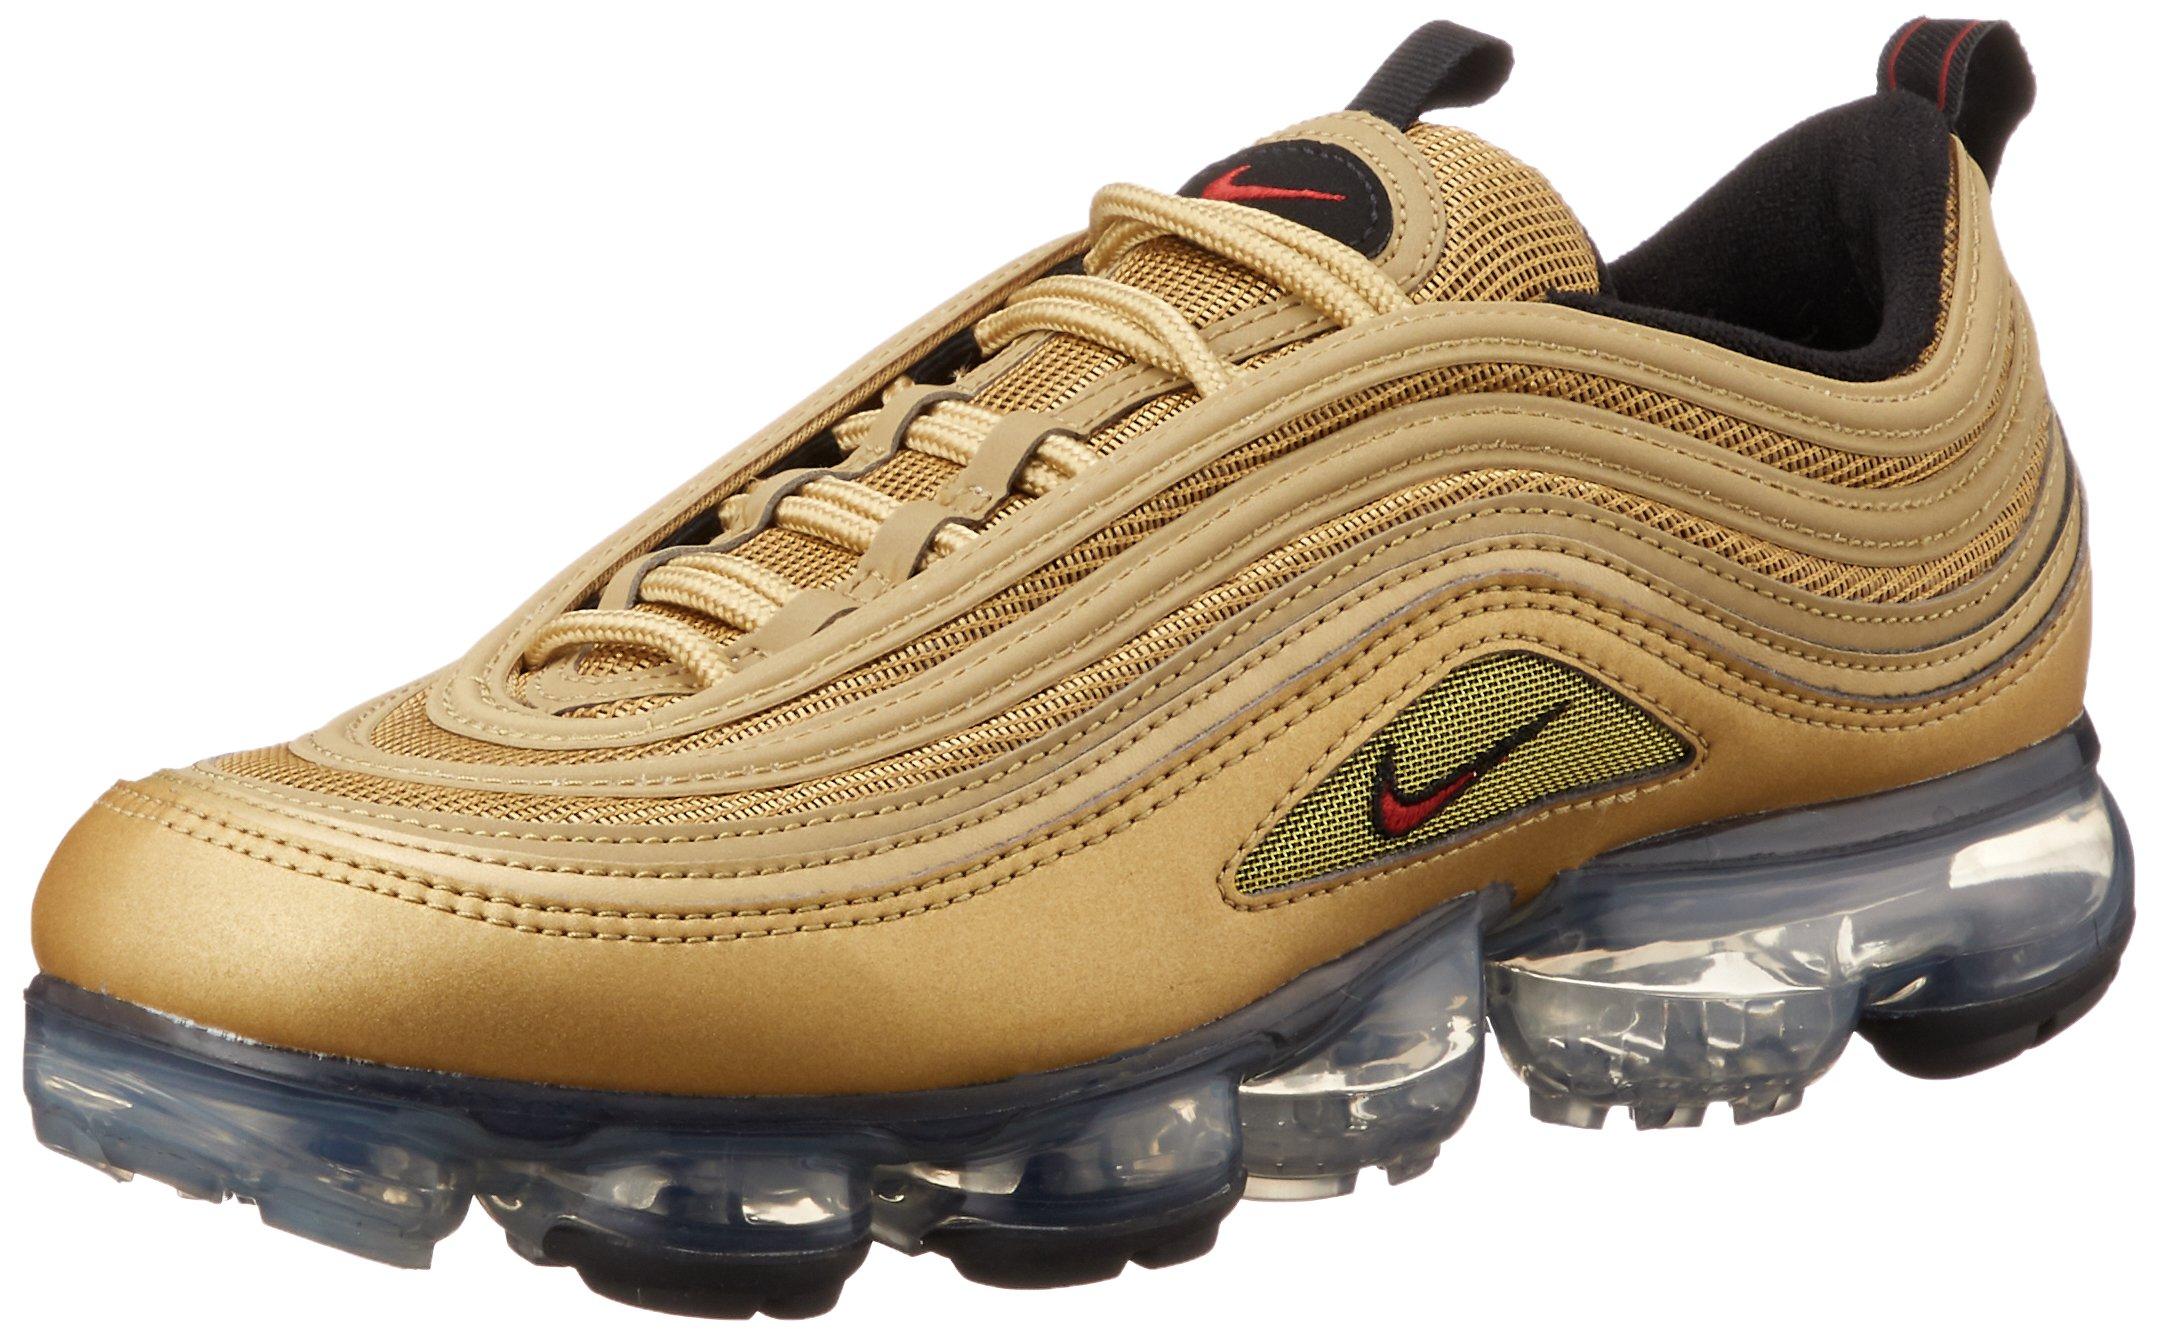 best service 9aba1 36657 Nike Air Vapormax '97 Men's Shoes Metallic Gold/Varsity Red aj7291-700 (11  D(M) US)